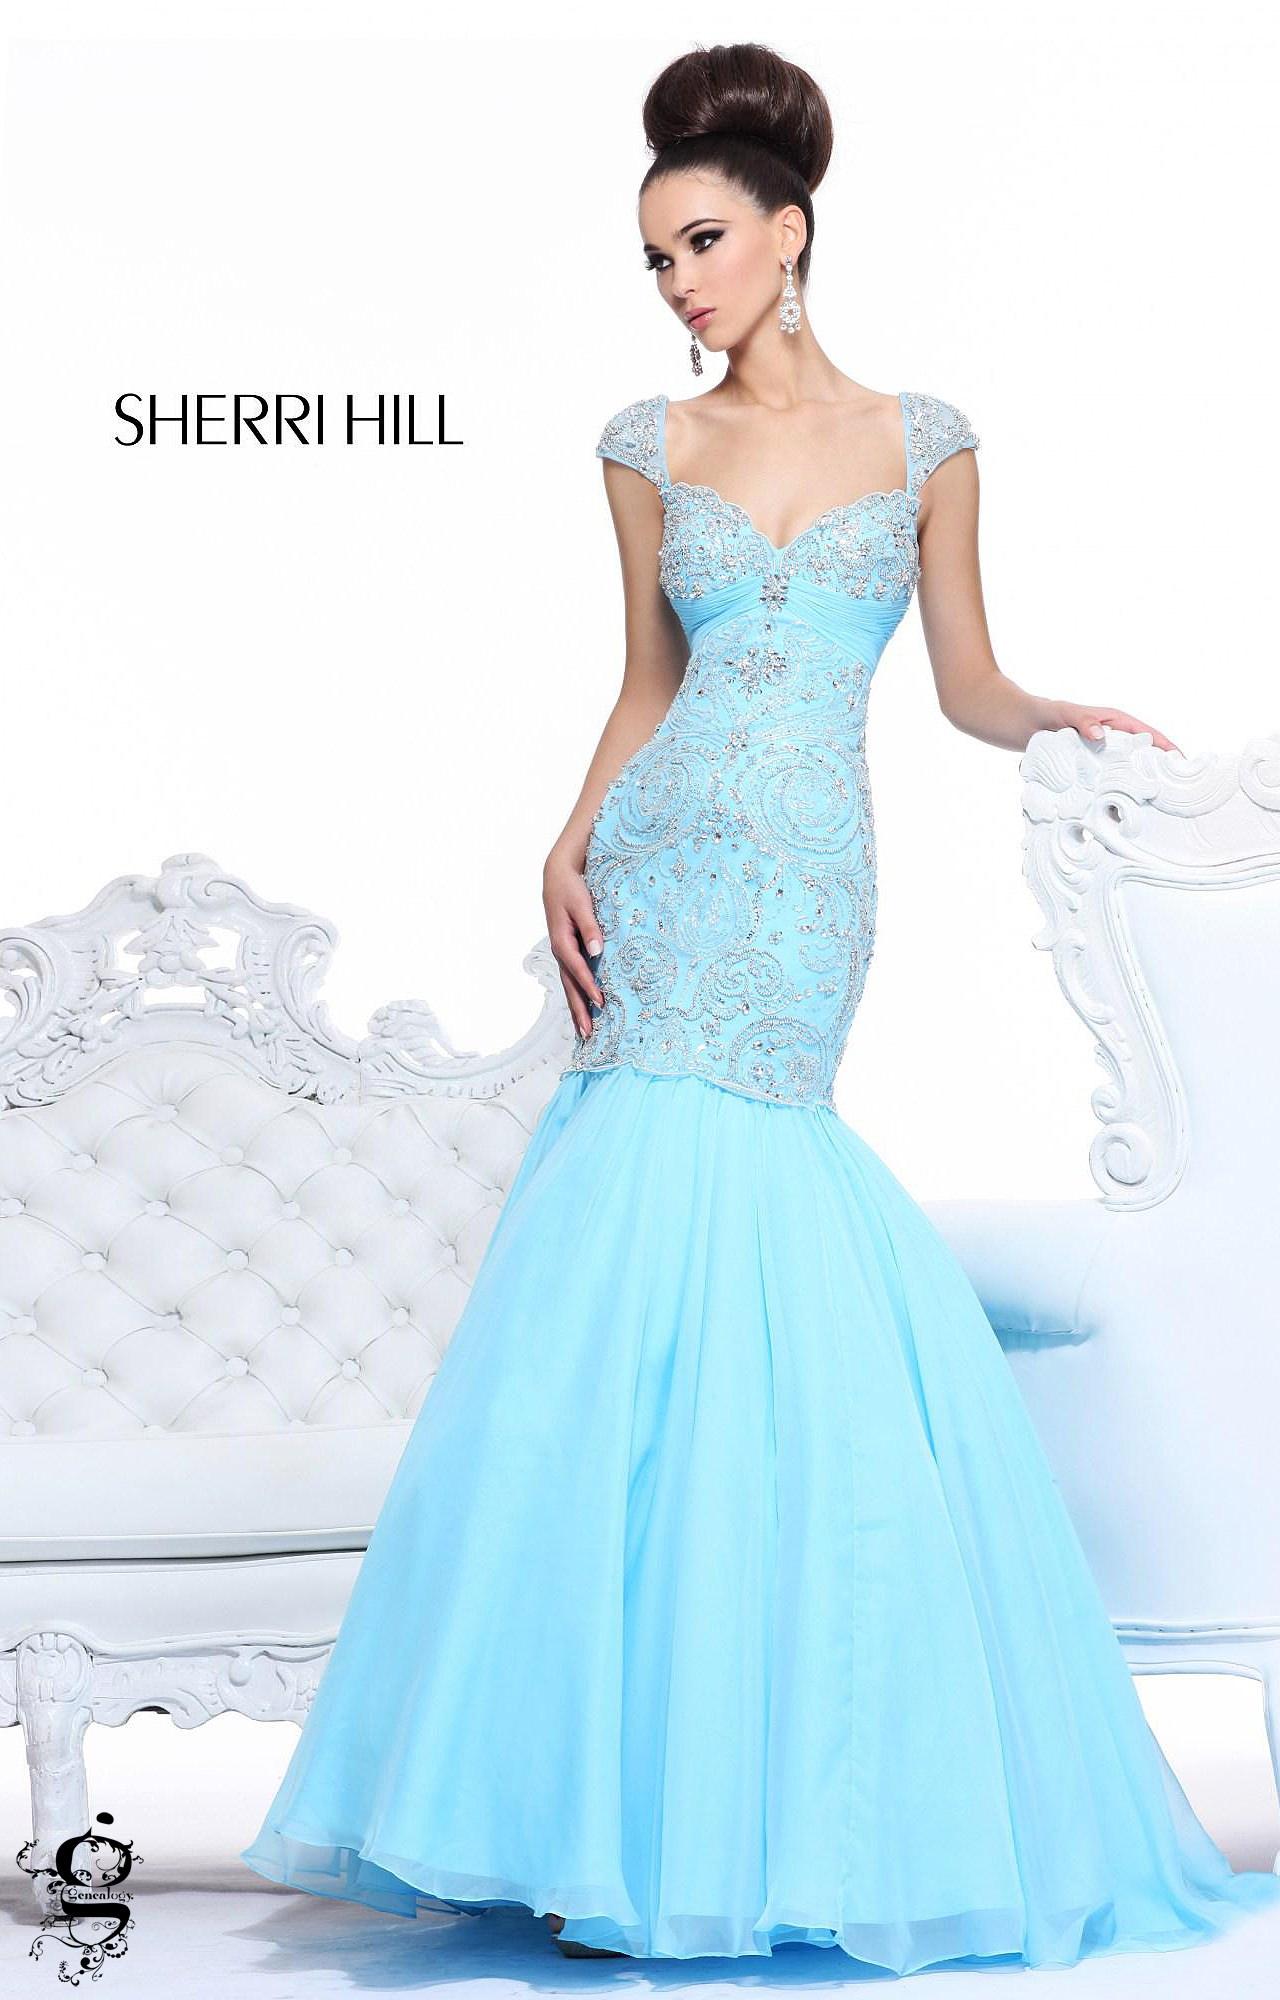 Sherri Hill 21036 - The Modern Cinderella Prom Dress